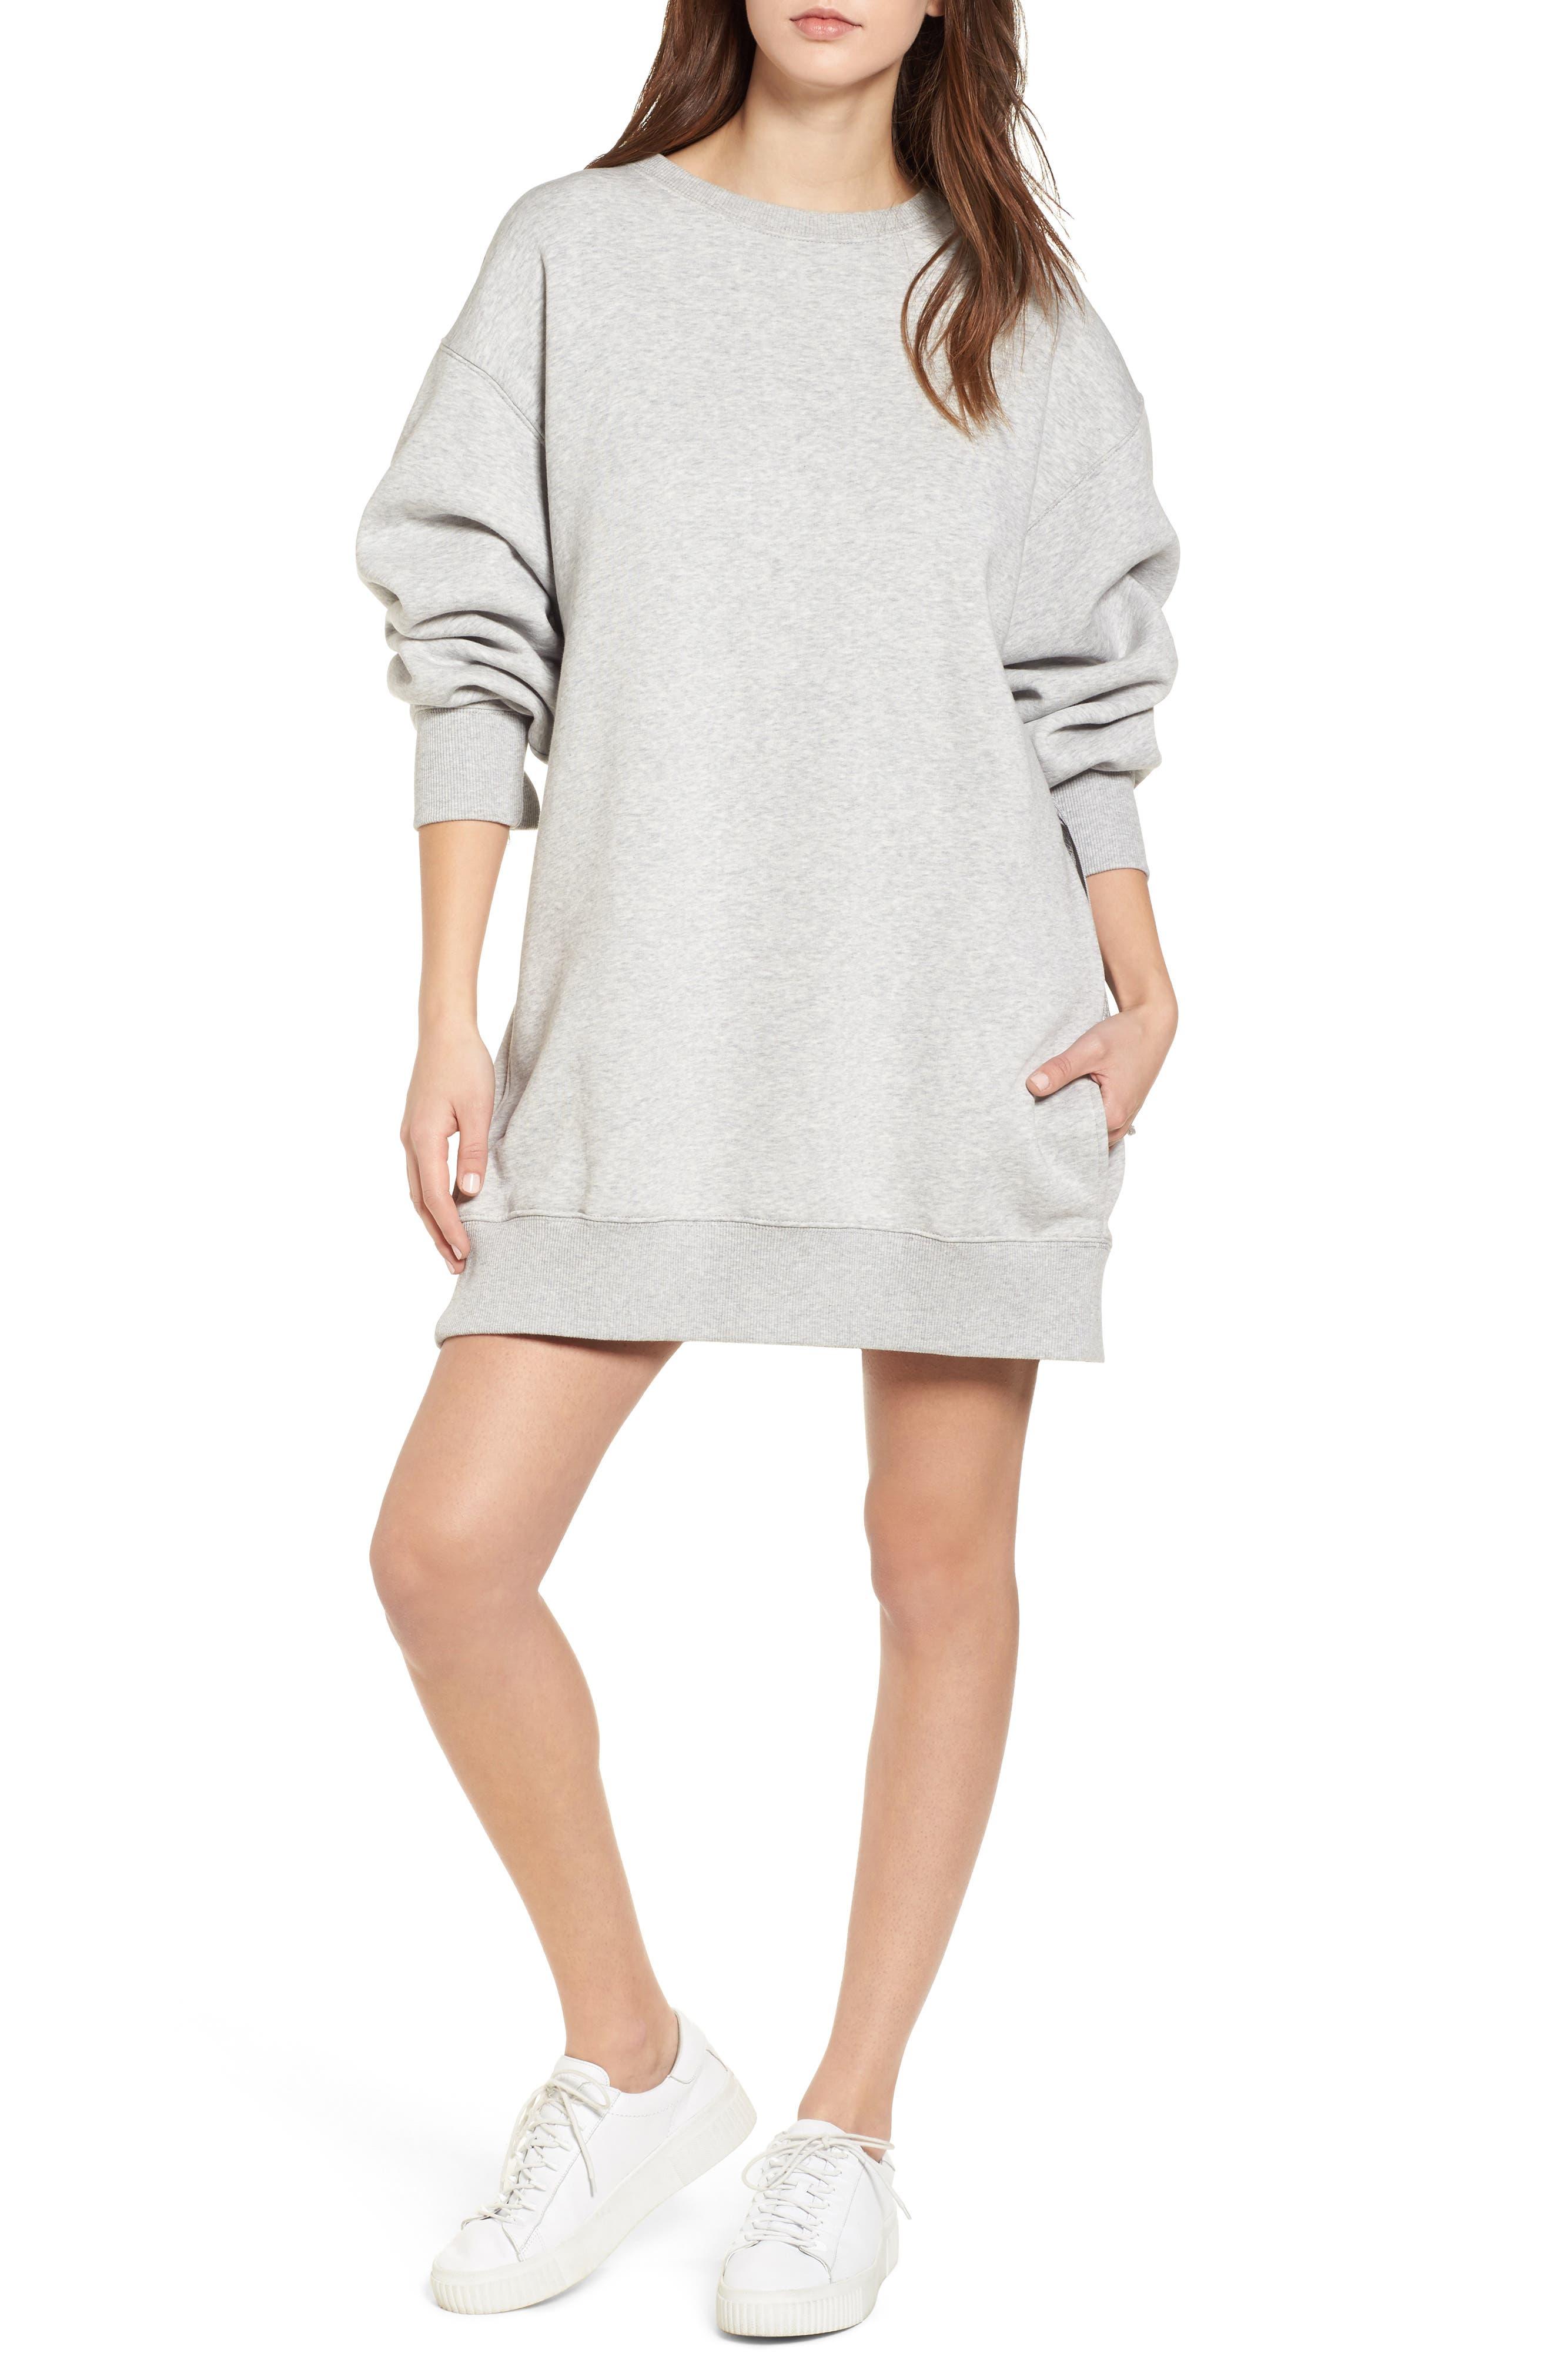 x Gigi Hadid Sweatshirt Dress,                         Main,                         color, 020